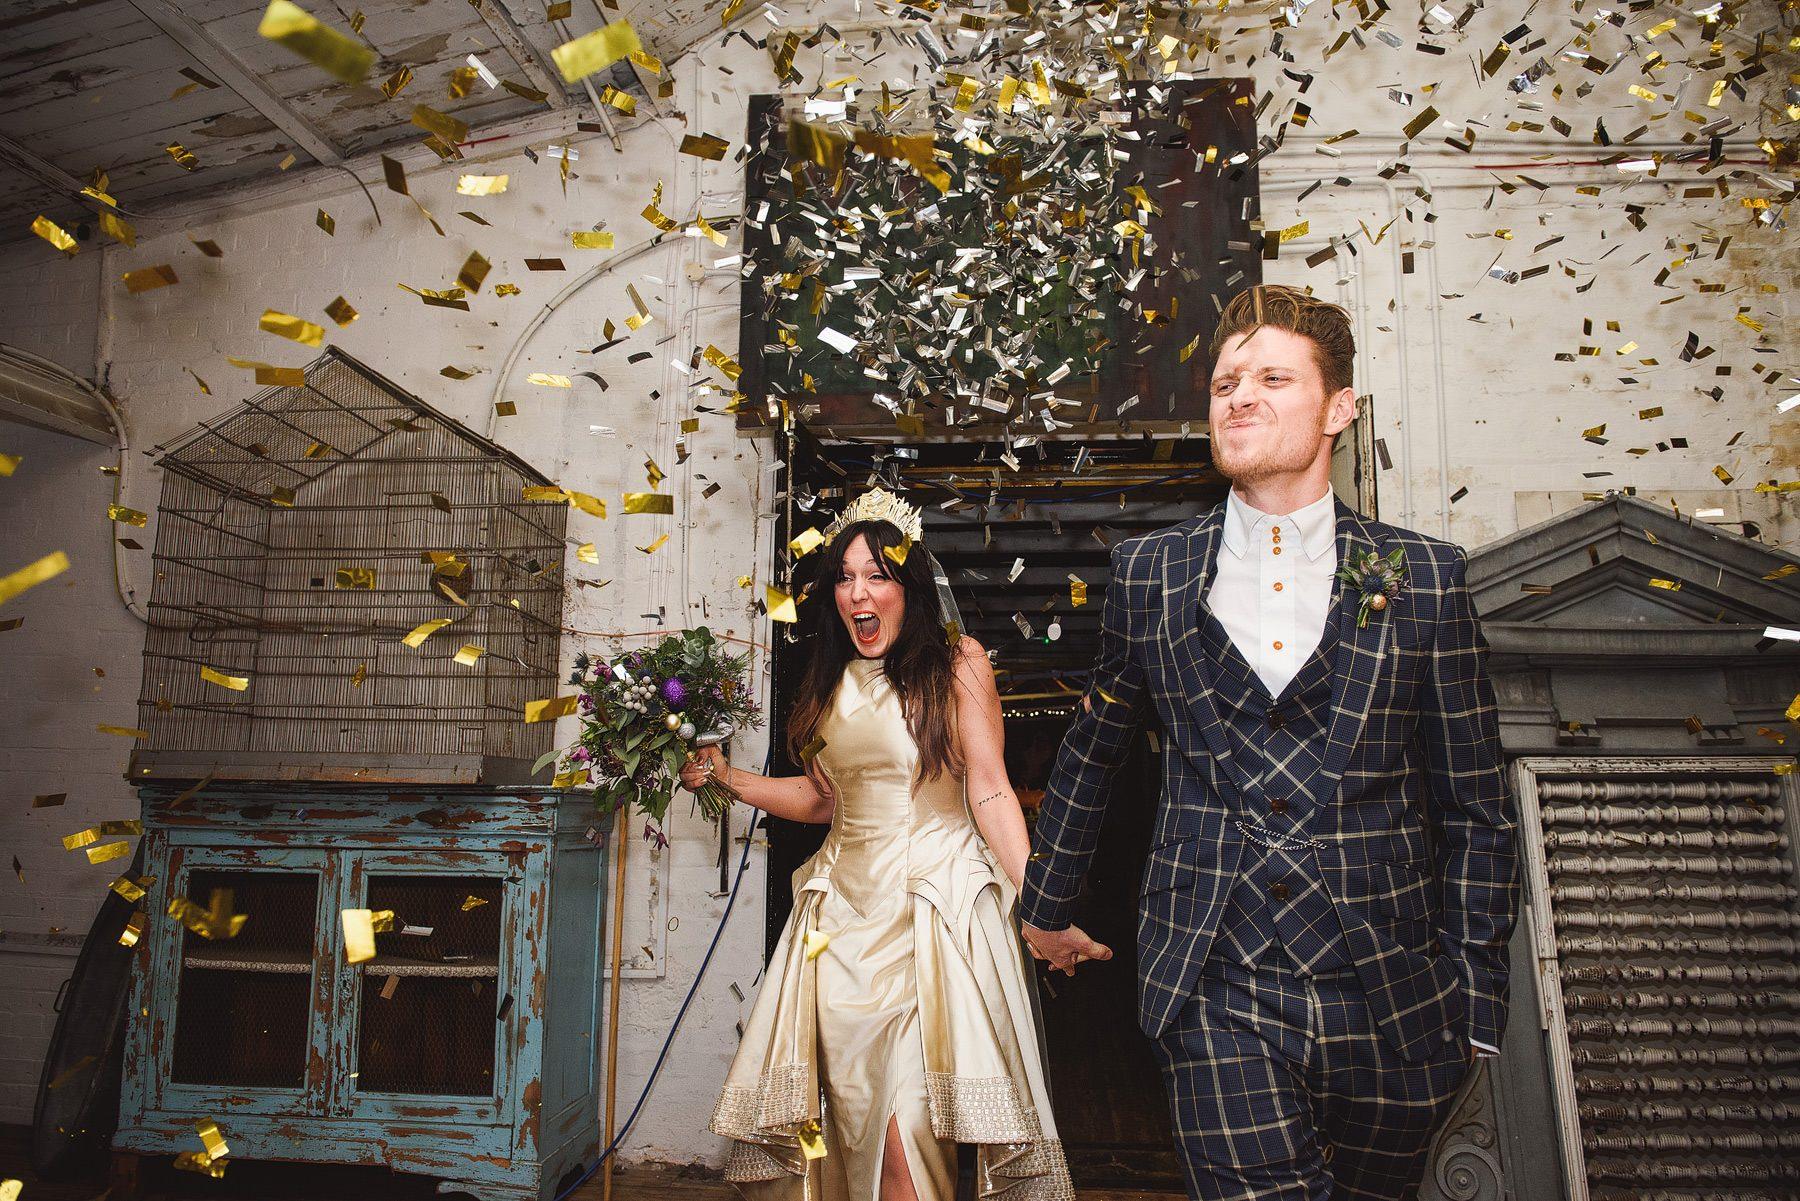 music themed wedding